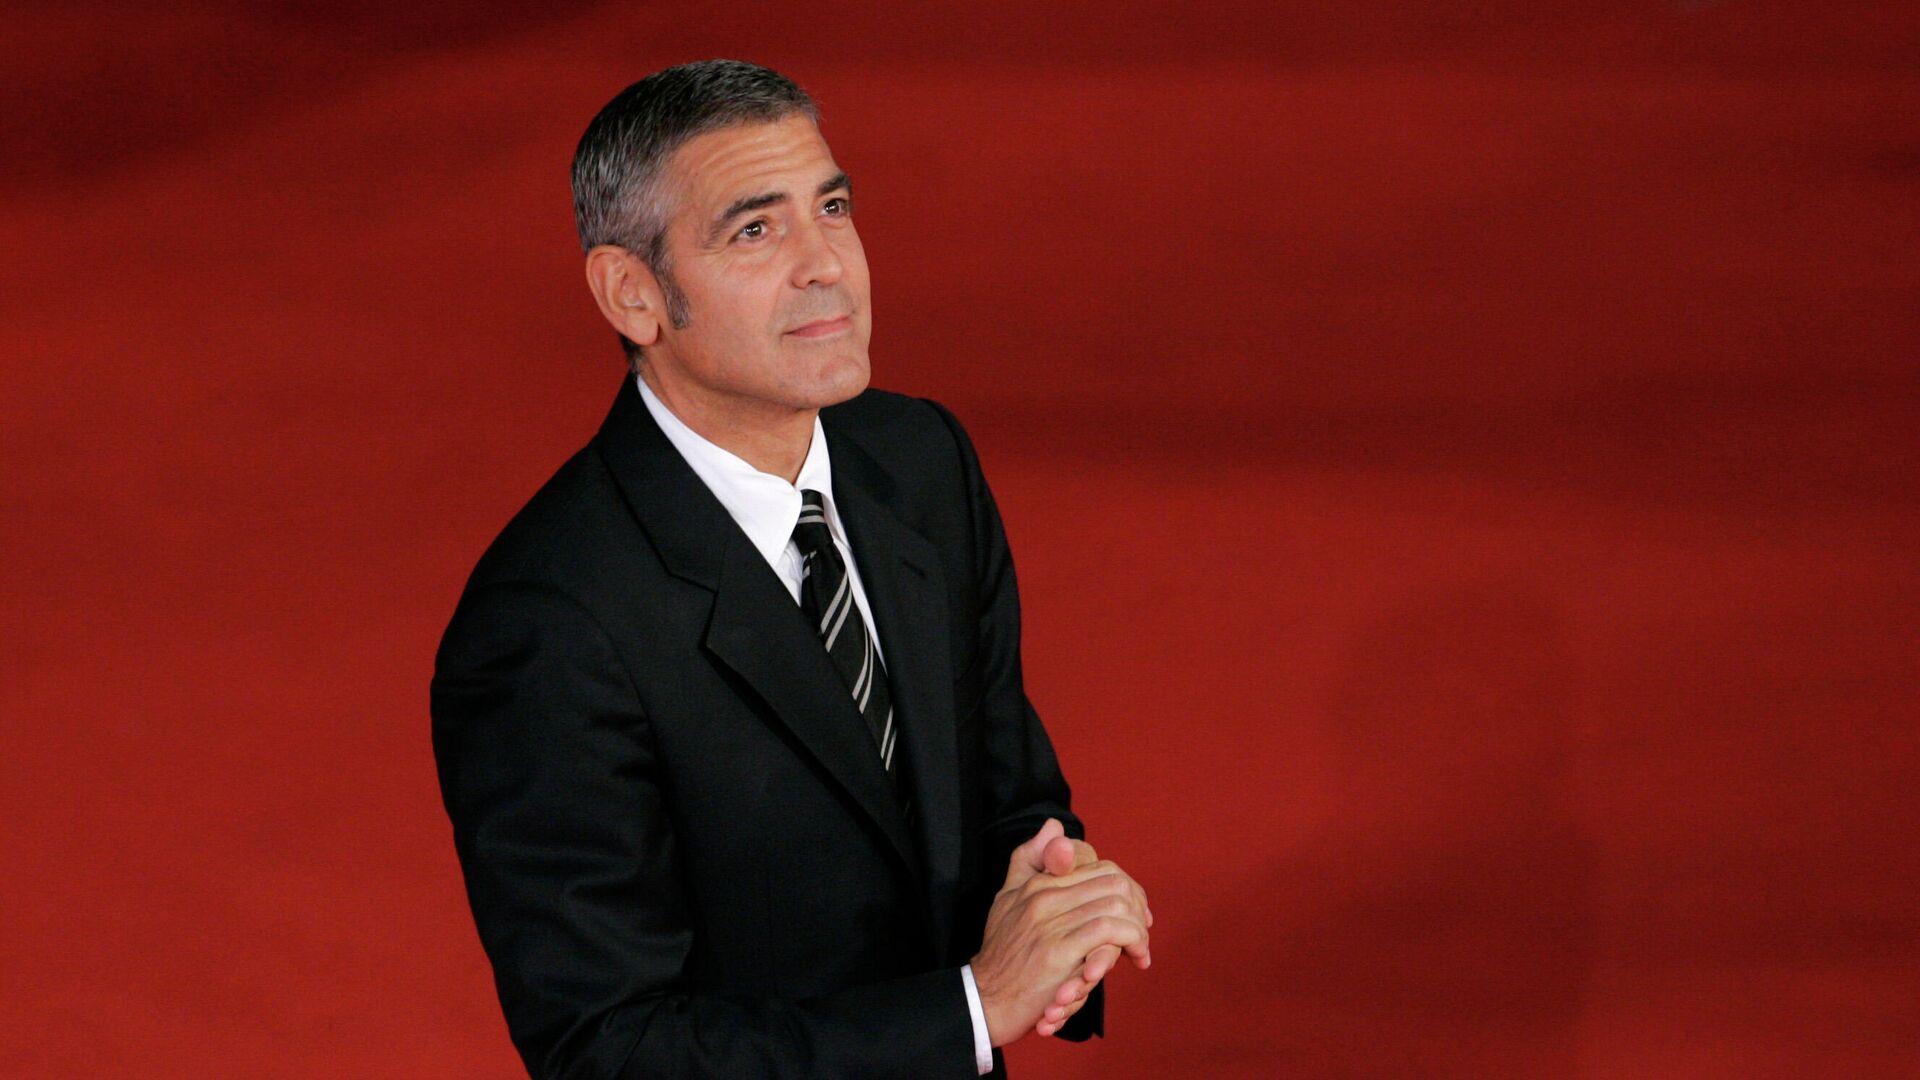 Американский актер и кинорежиссер Джордж Клуни на красной дорожке - РИА Новости, 1920, 06.05.2021